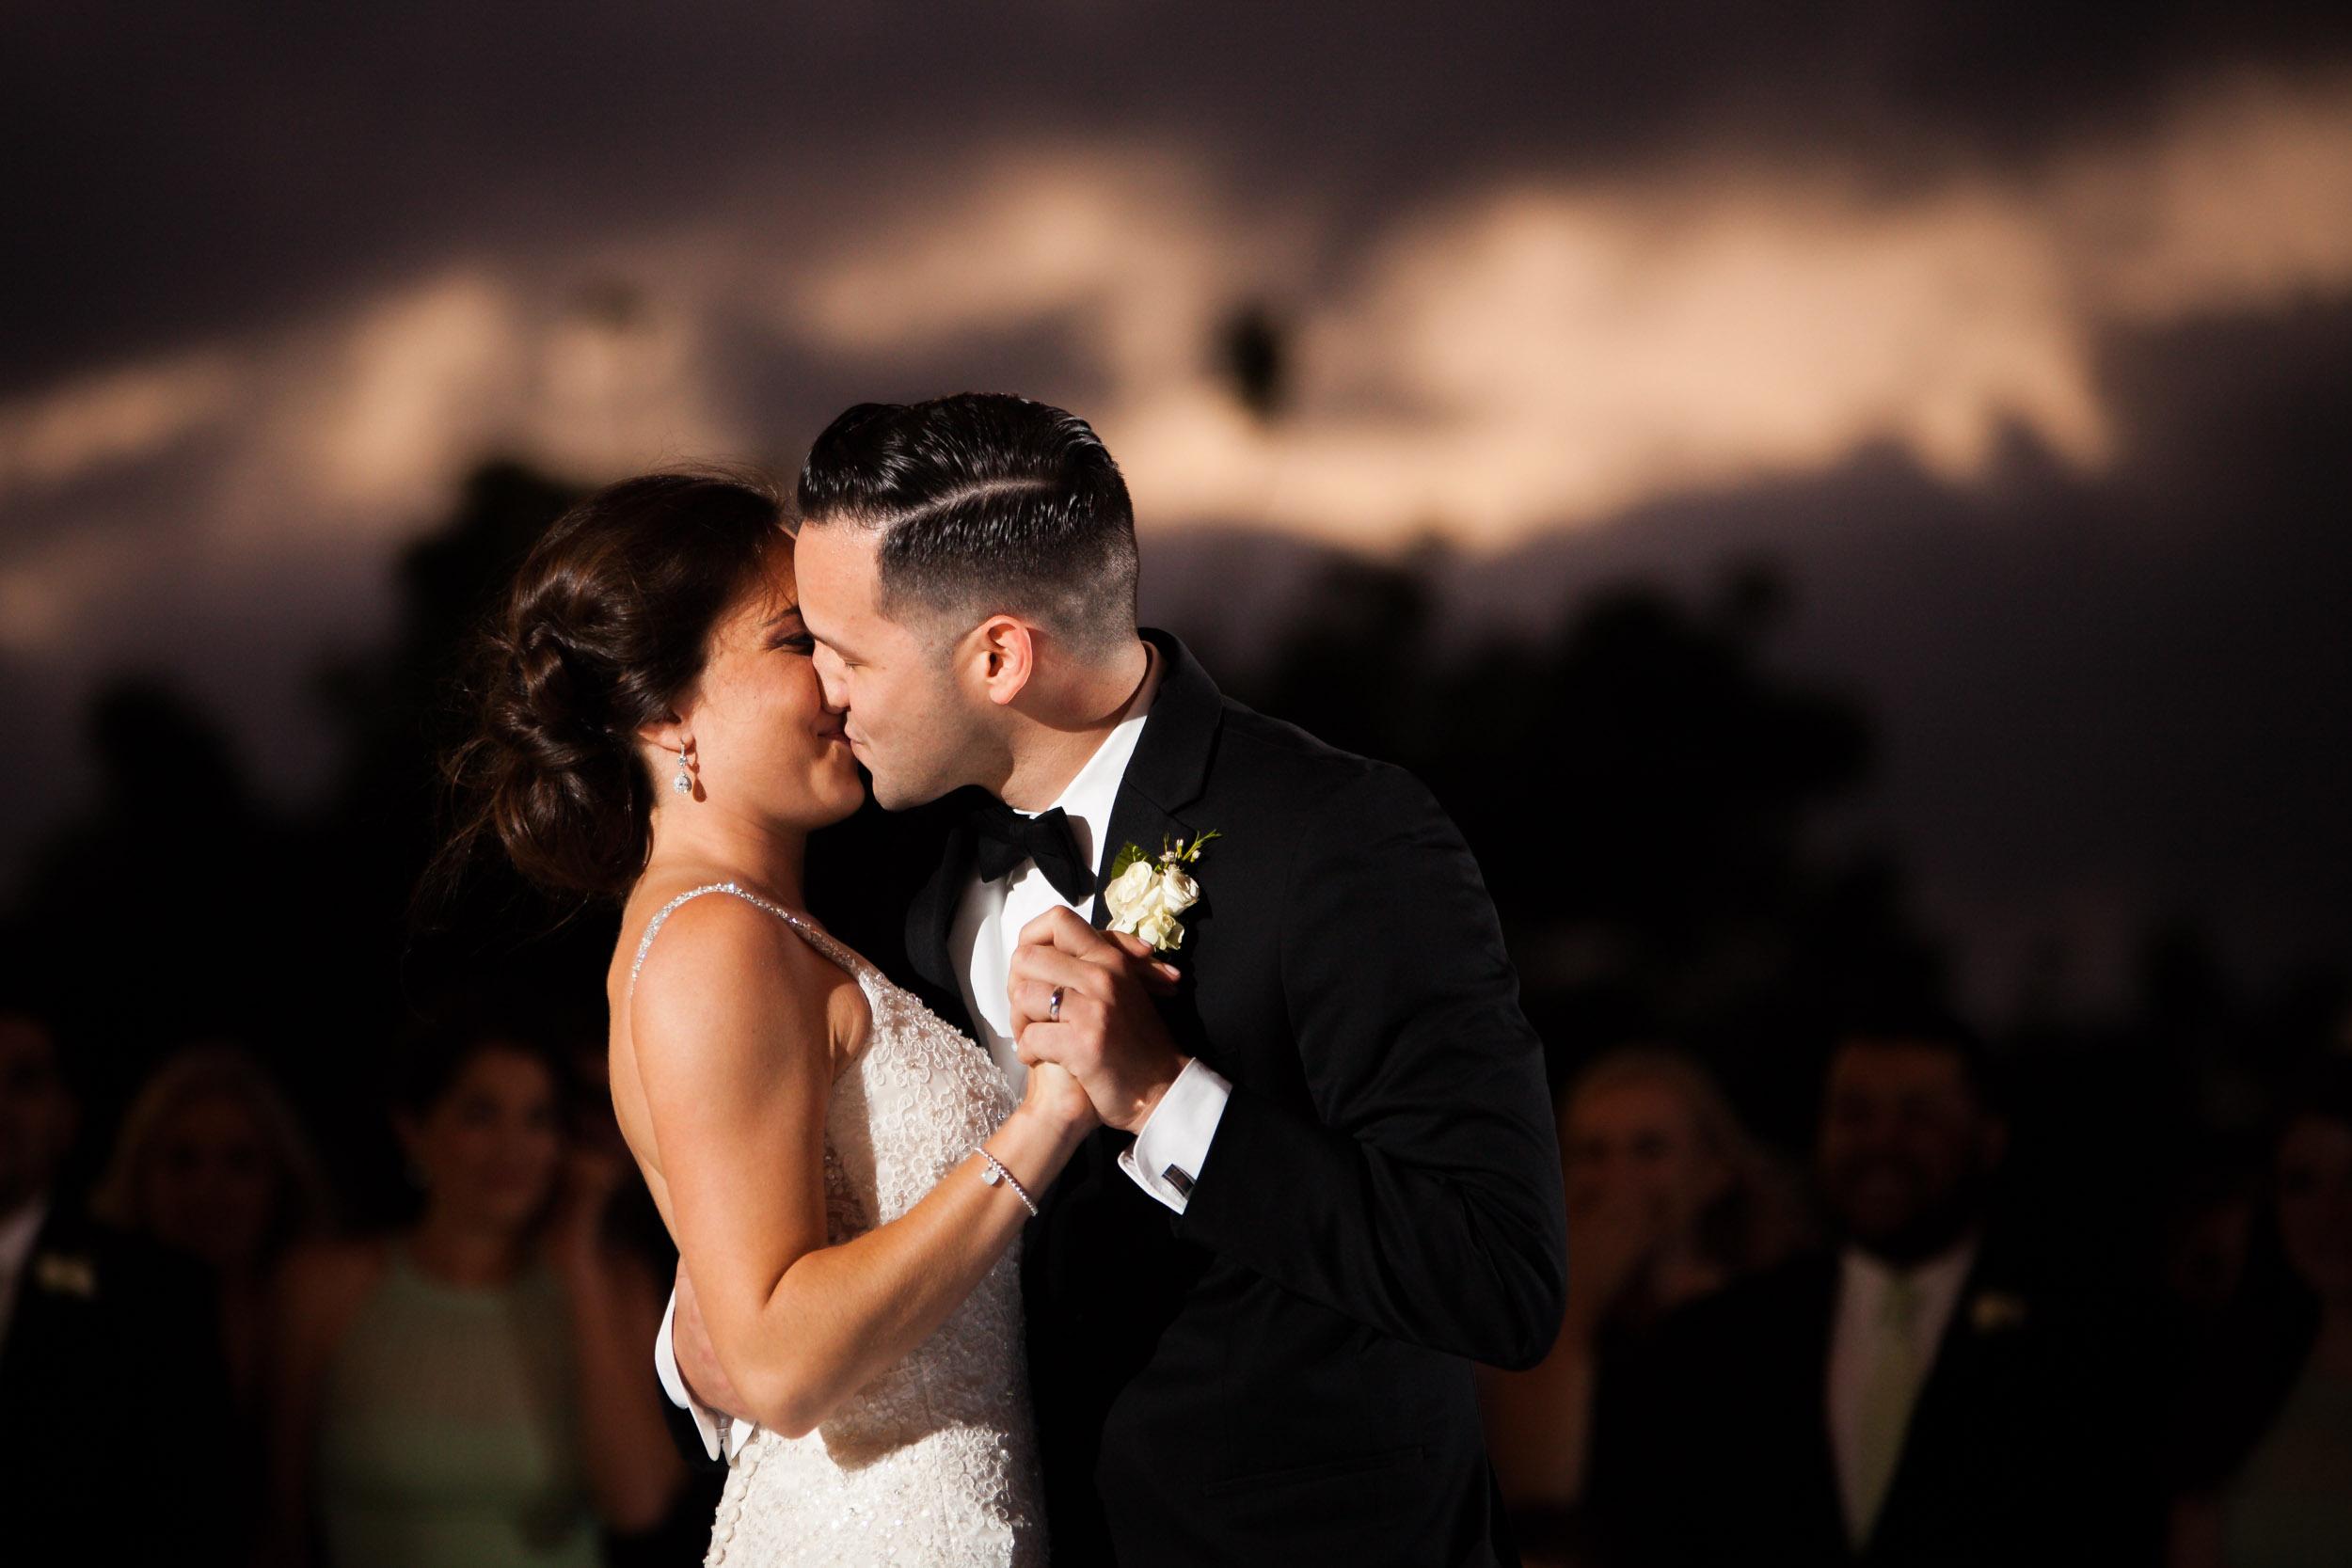 Flordia-Wedding-Photography-55.jpg